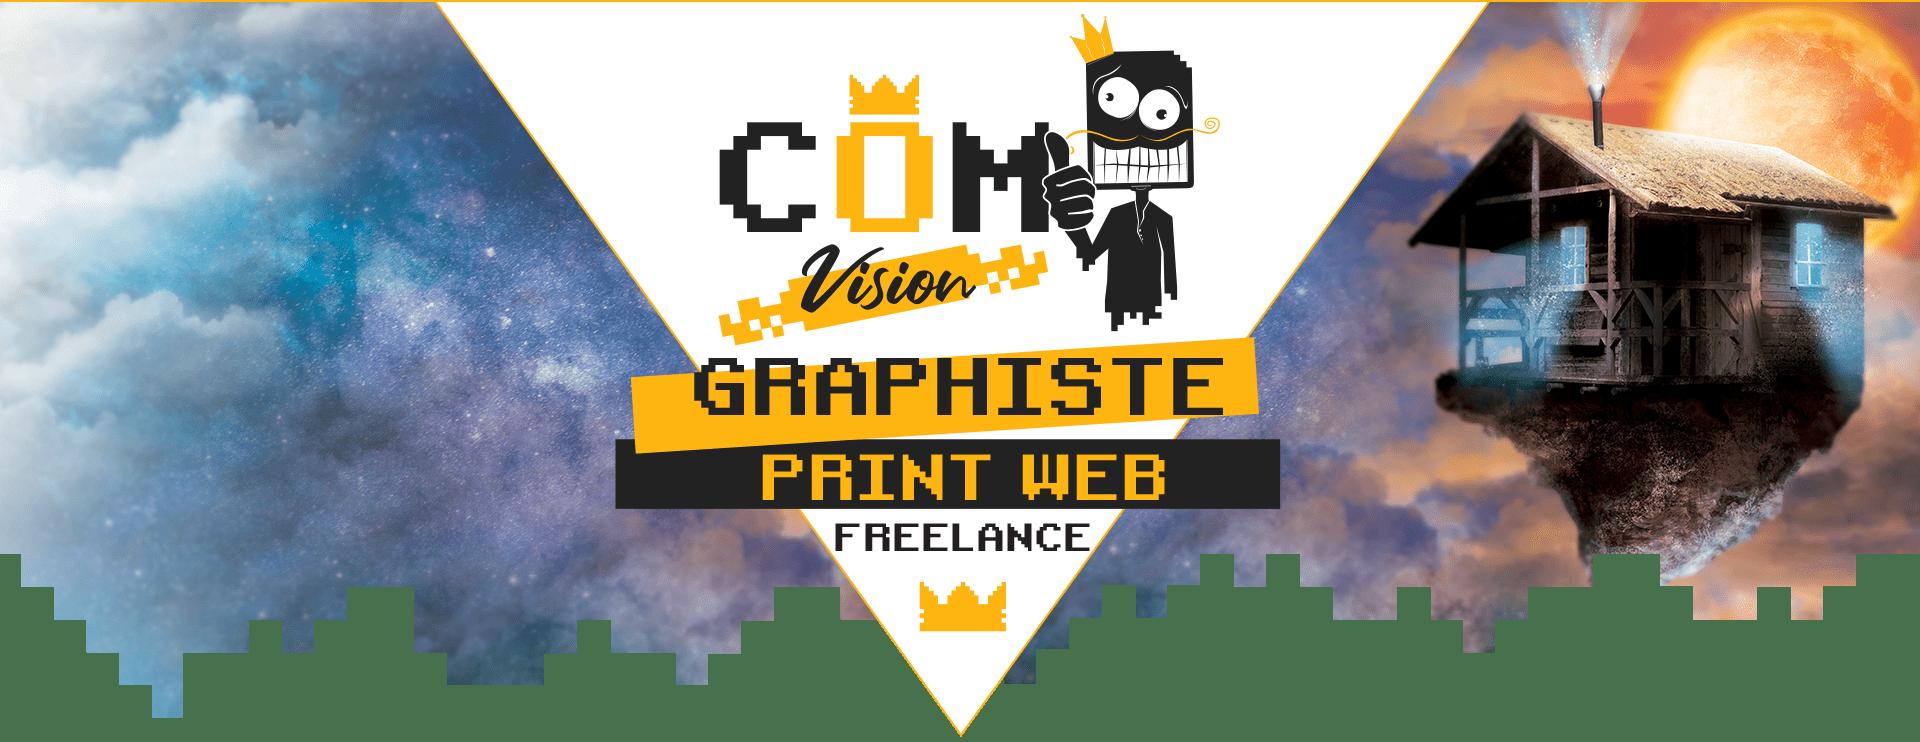 graphiste webdesigner niort la rochelle